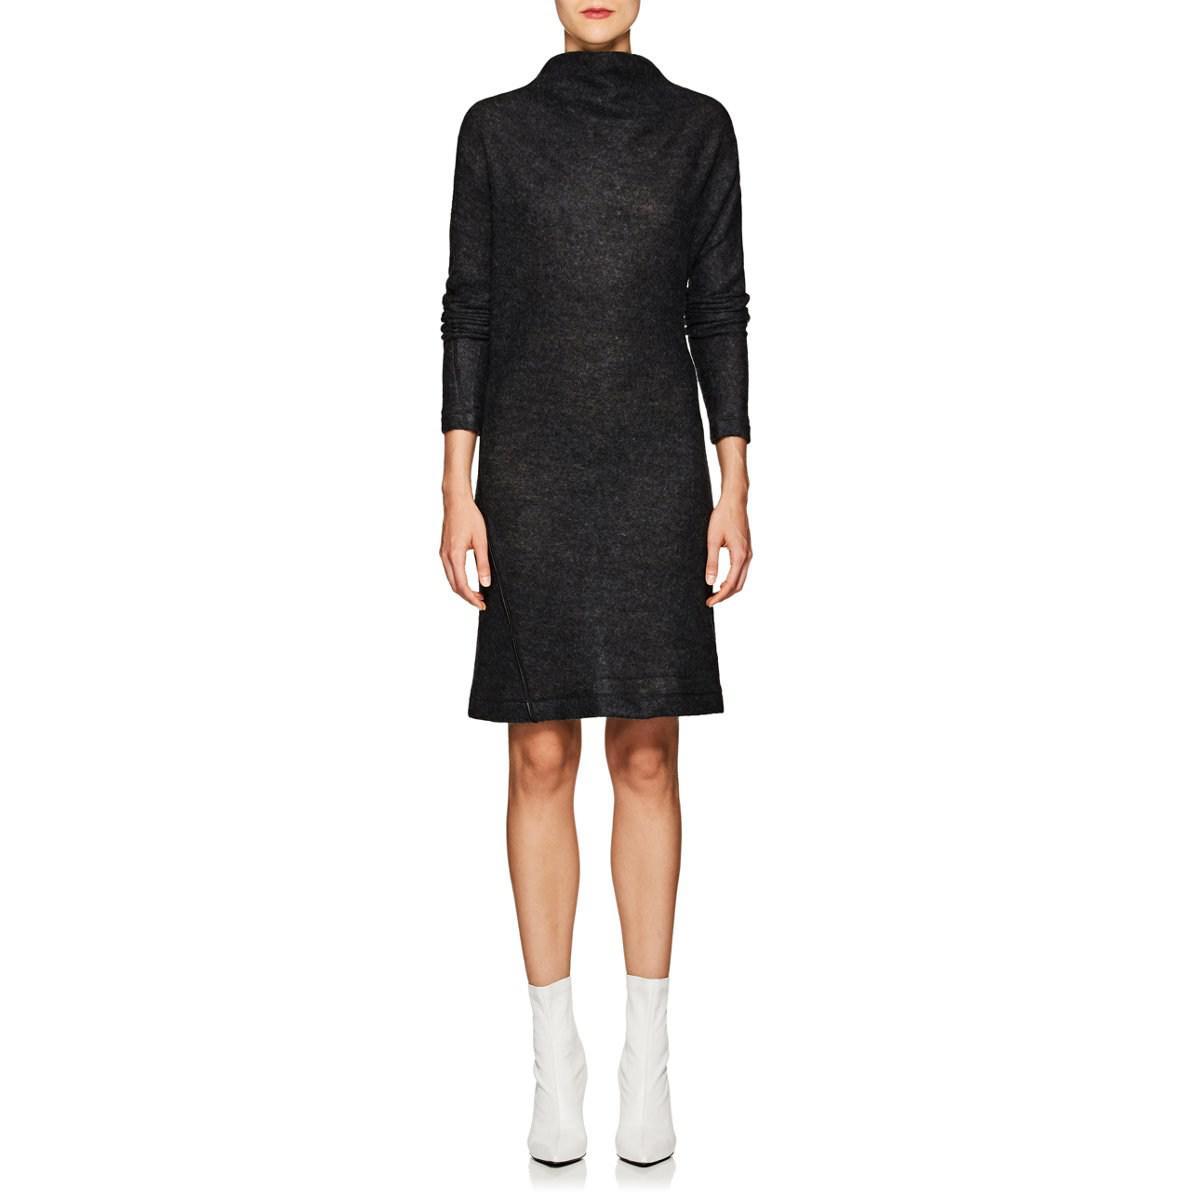 e3f639d51ac Helmut Lang Wool-blend Asymmetric Sweaterdress in Black - Lyst